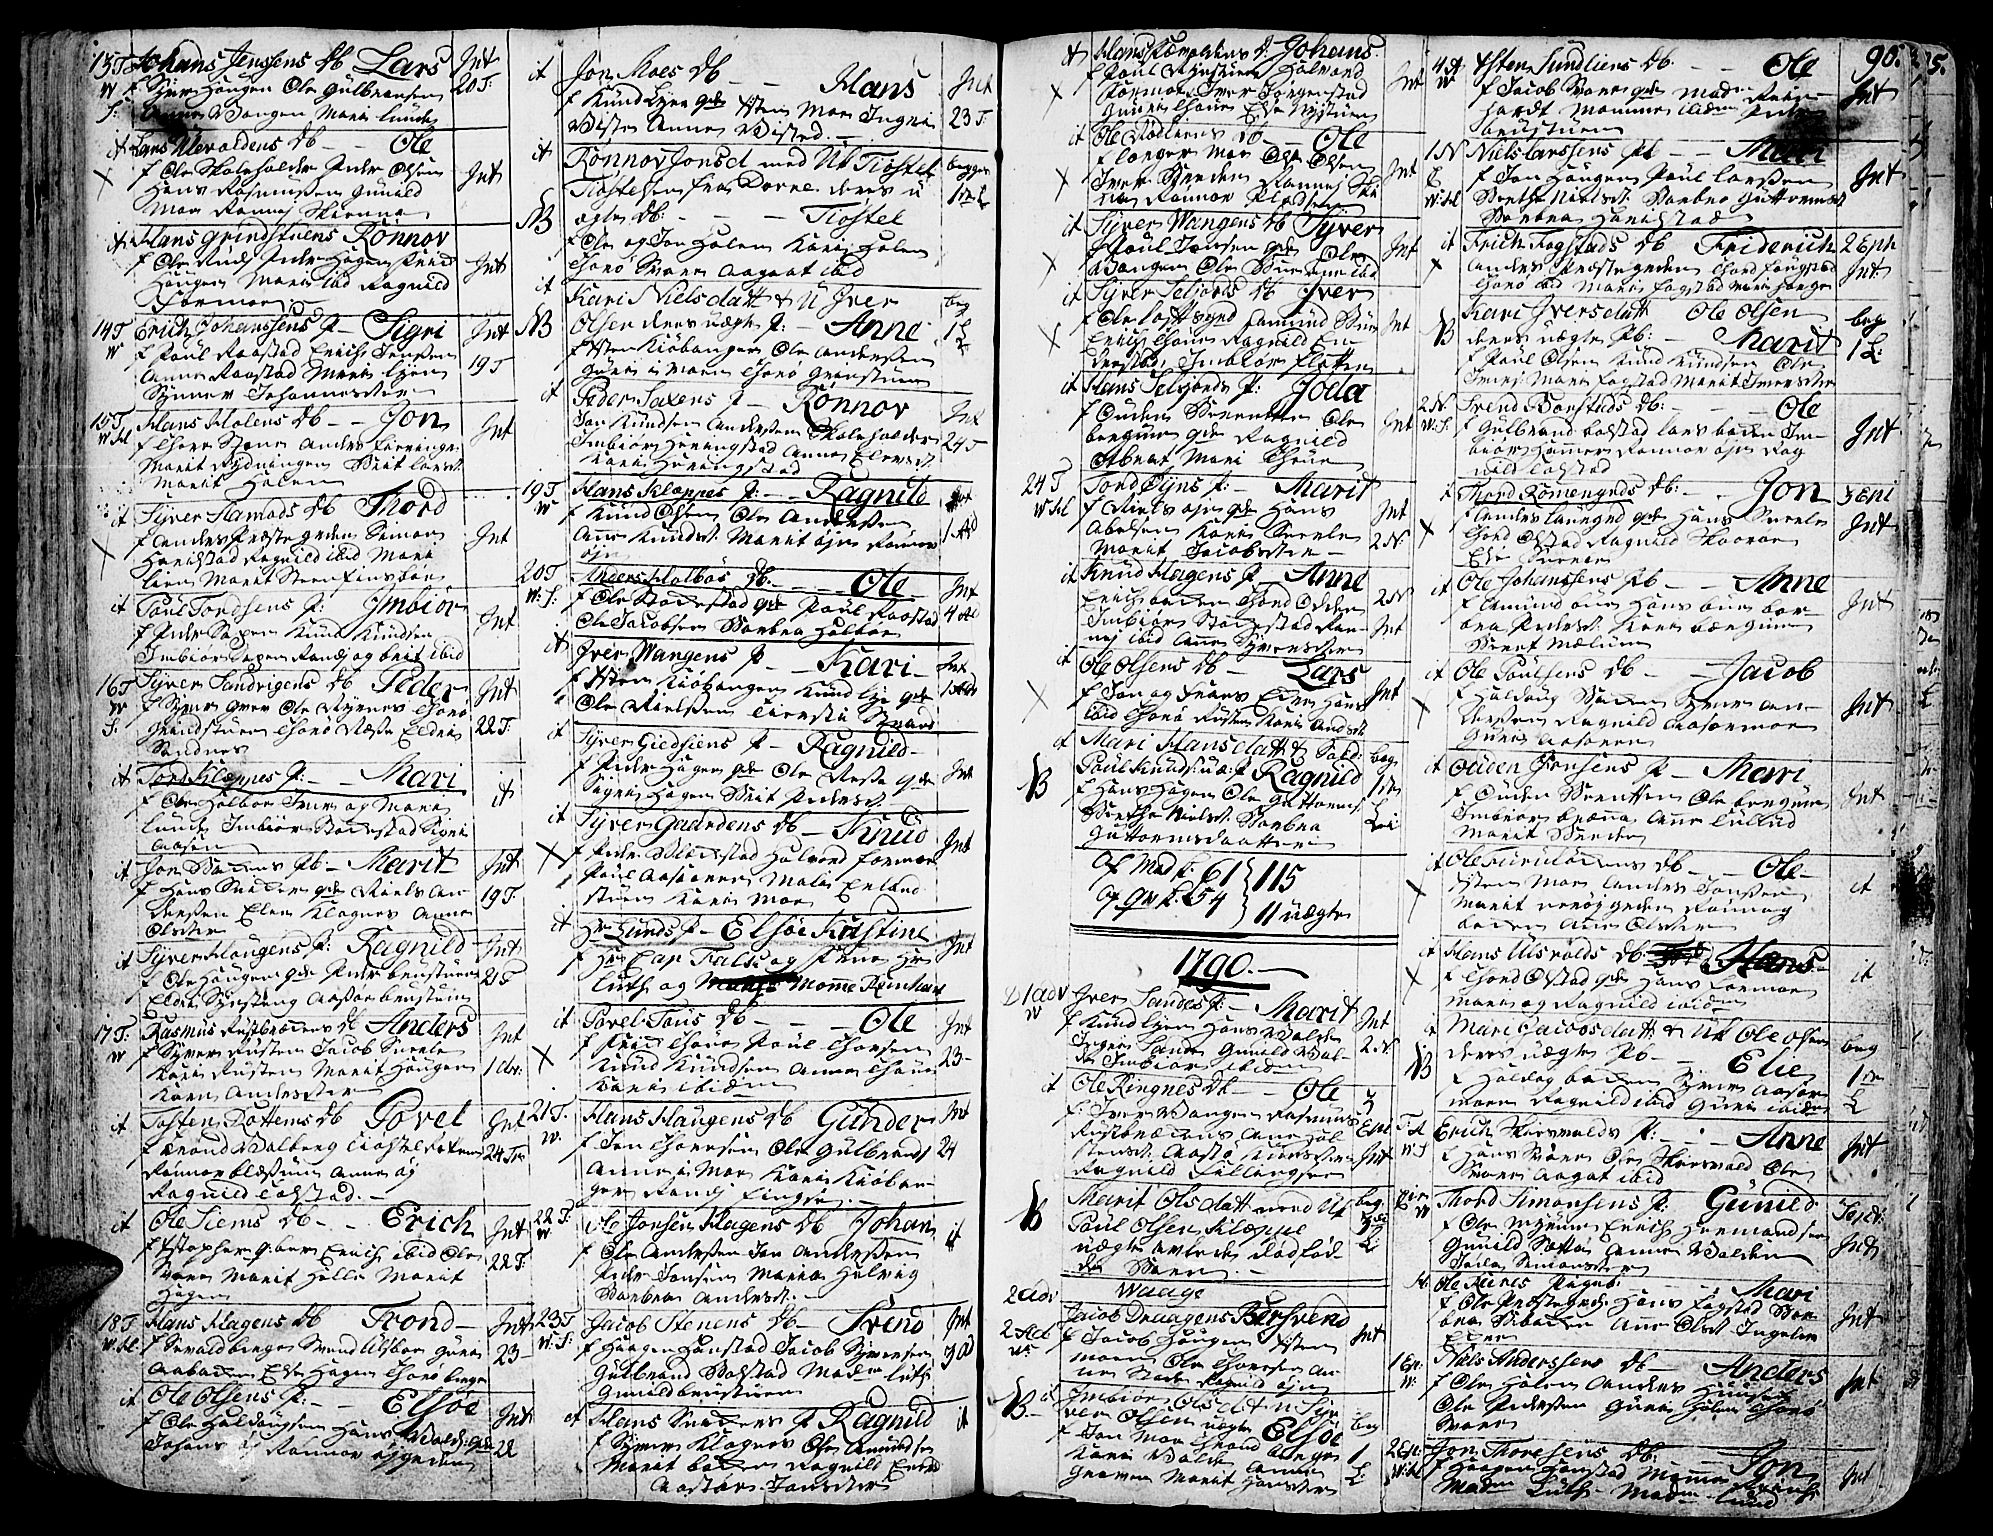 SAH, Vågå prestekontor, Ministerialbok nr. 1, 1739-1810, s. 90